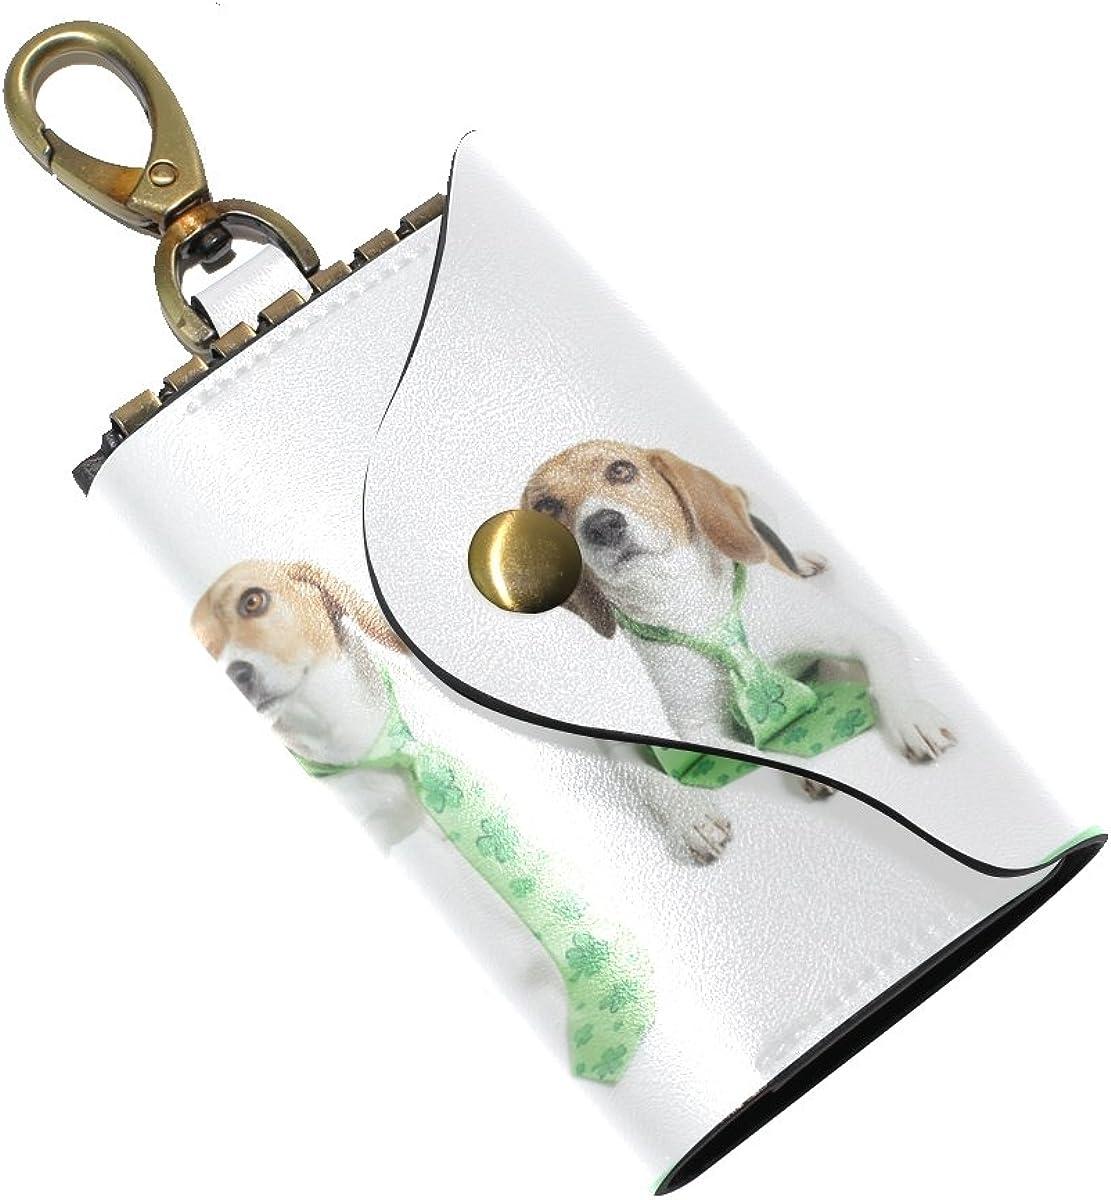 DEYYA Beaglestpatsad Leather Key Case Wallets Unisex Keychain Key Holder with 6 Hooks Snap Closure